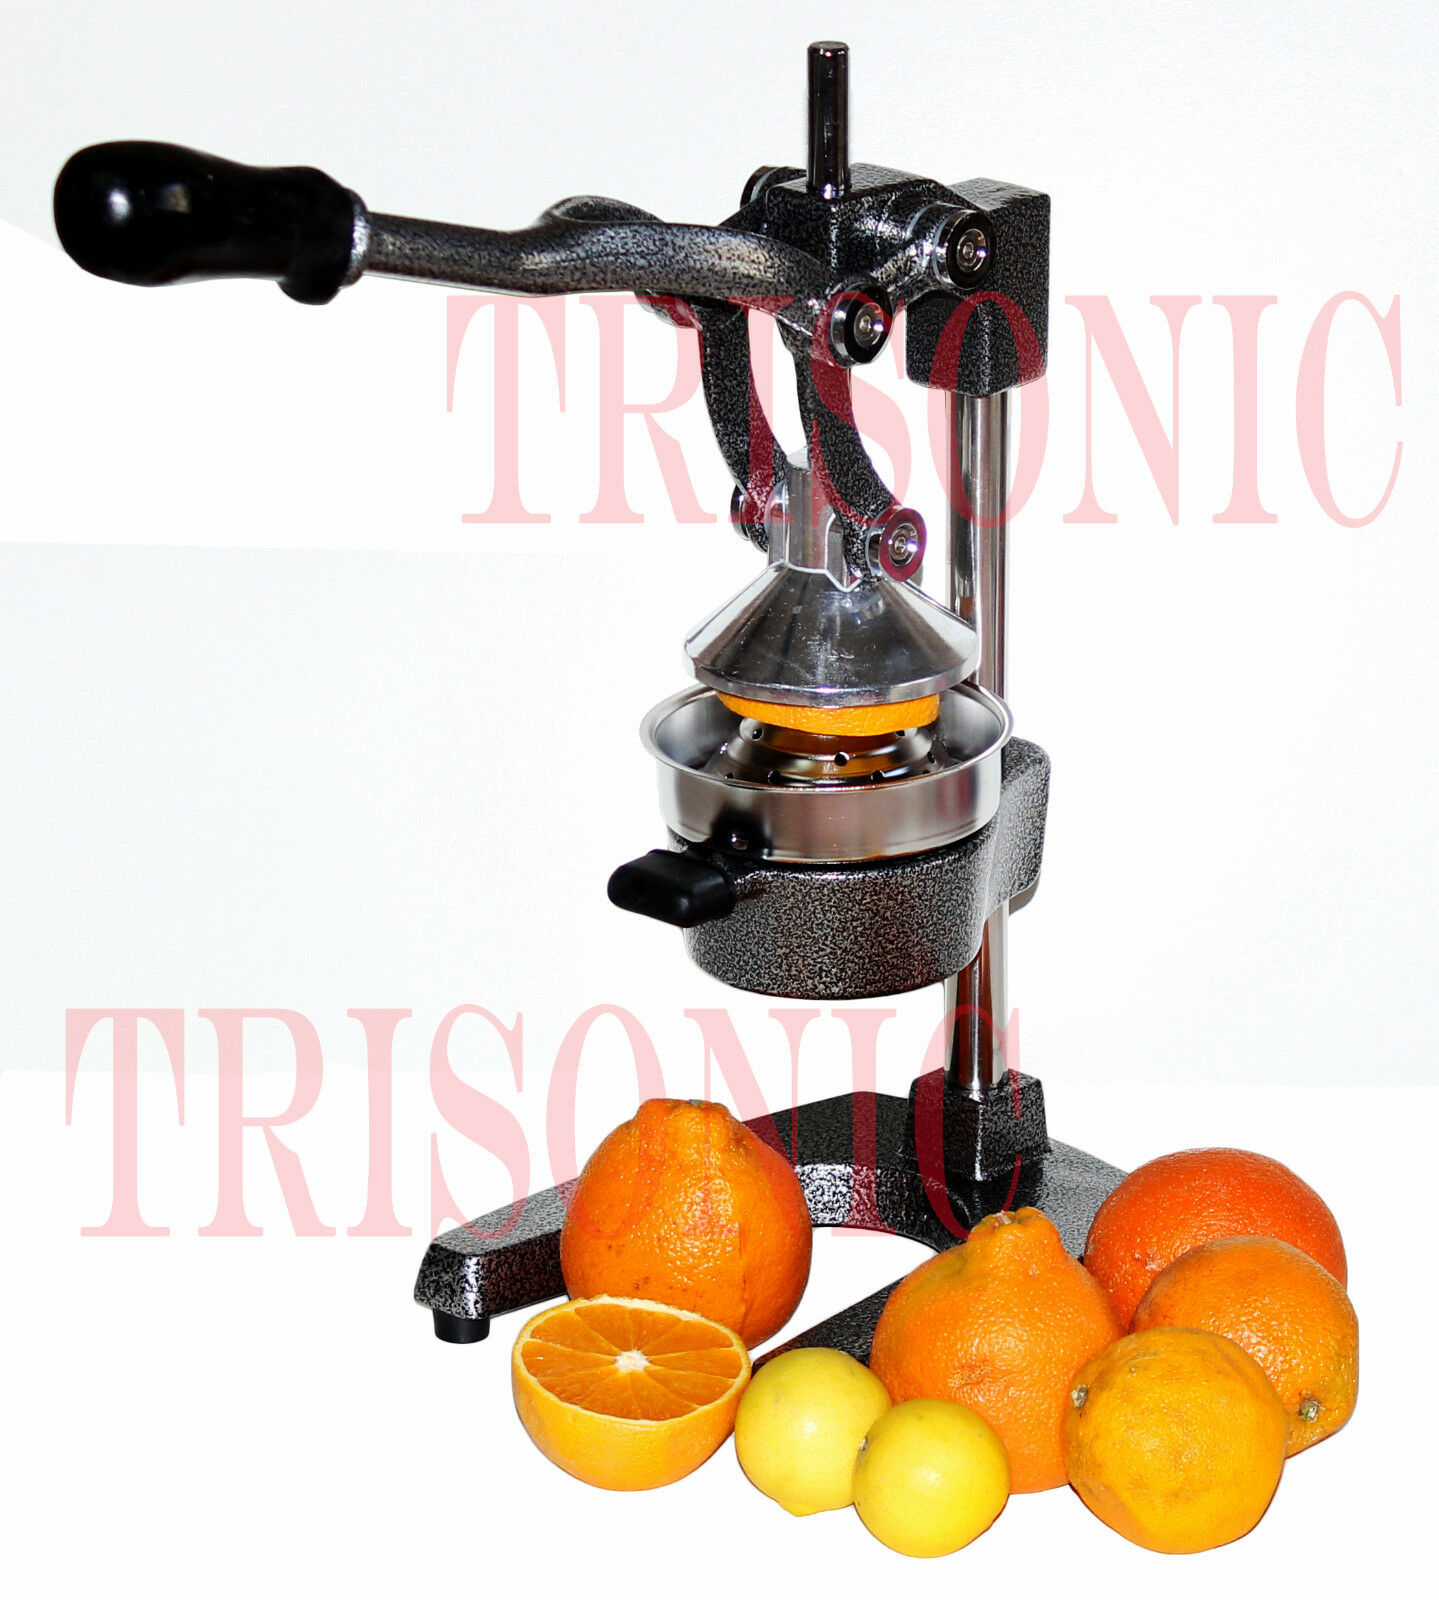 Heavy Duty Commercial Pro Citrus Press Orange Manual Extractor Extractor Extractor Squeezer Juicer efb45a